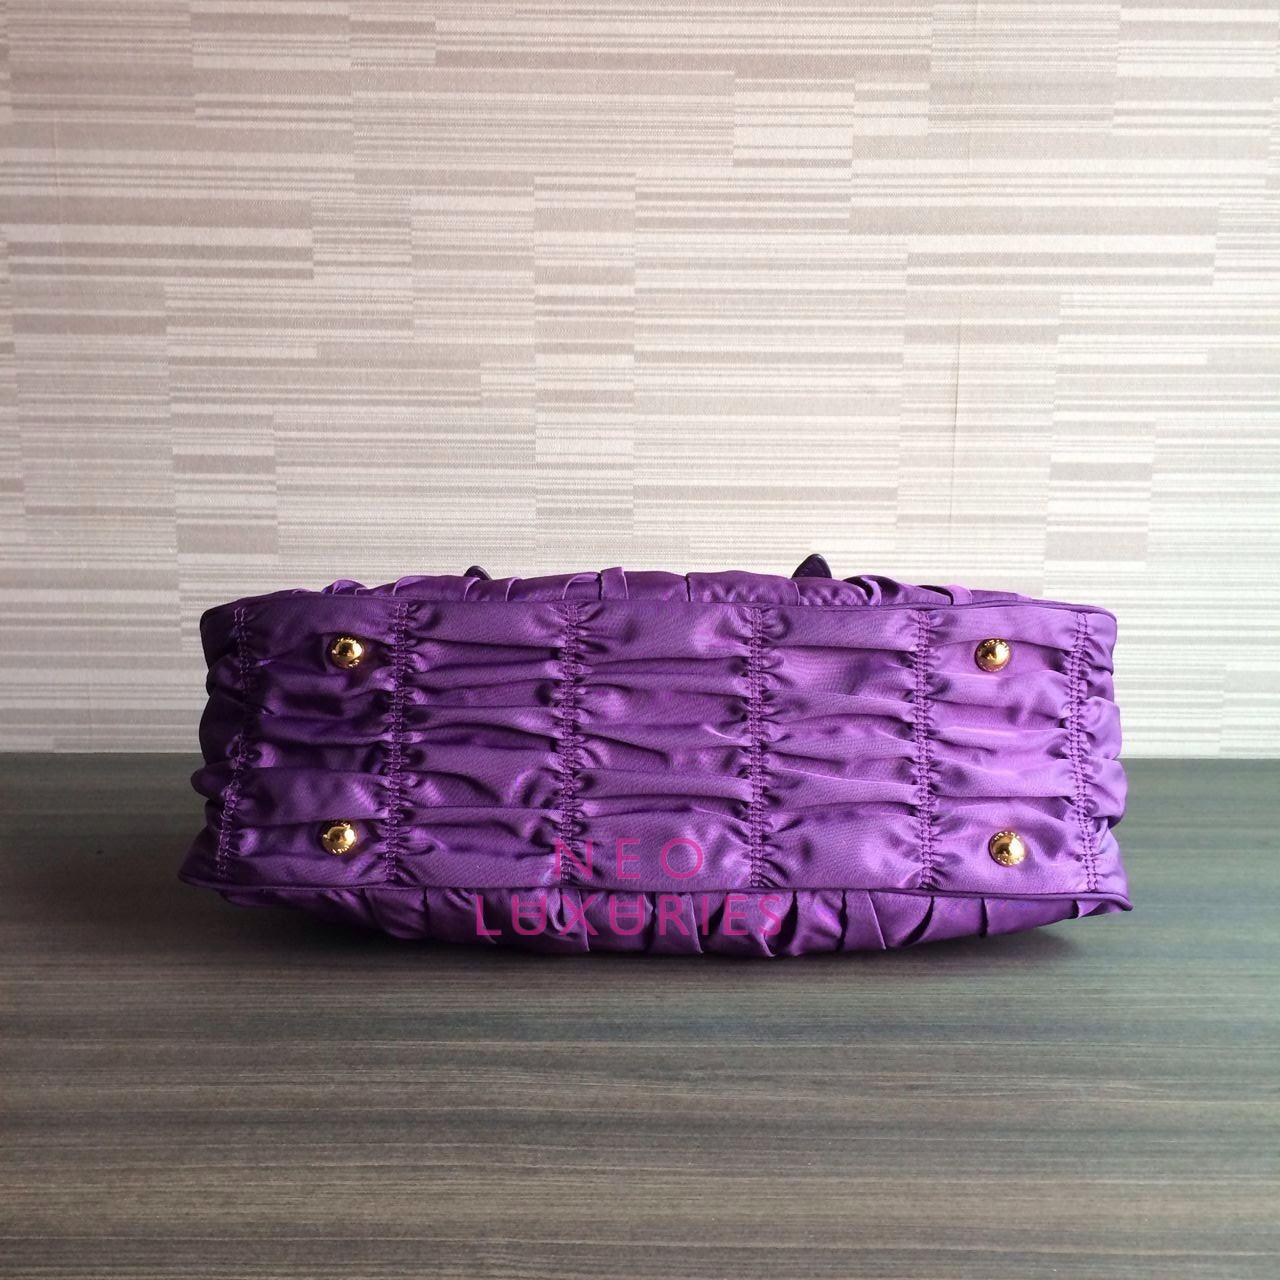 prada saffiano lux tote bag mini - Neo LUXuries: SOLD: PRADA Tessuto/Nappa Gaufre' Small Top Handle ...